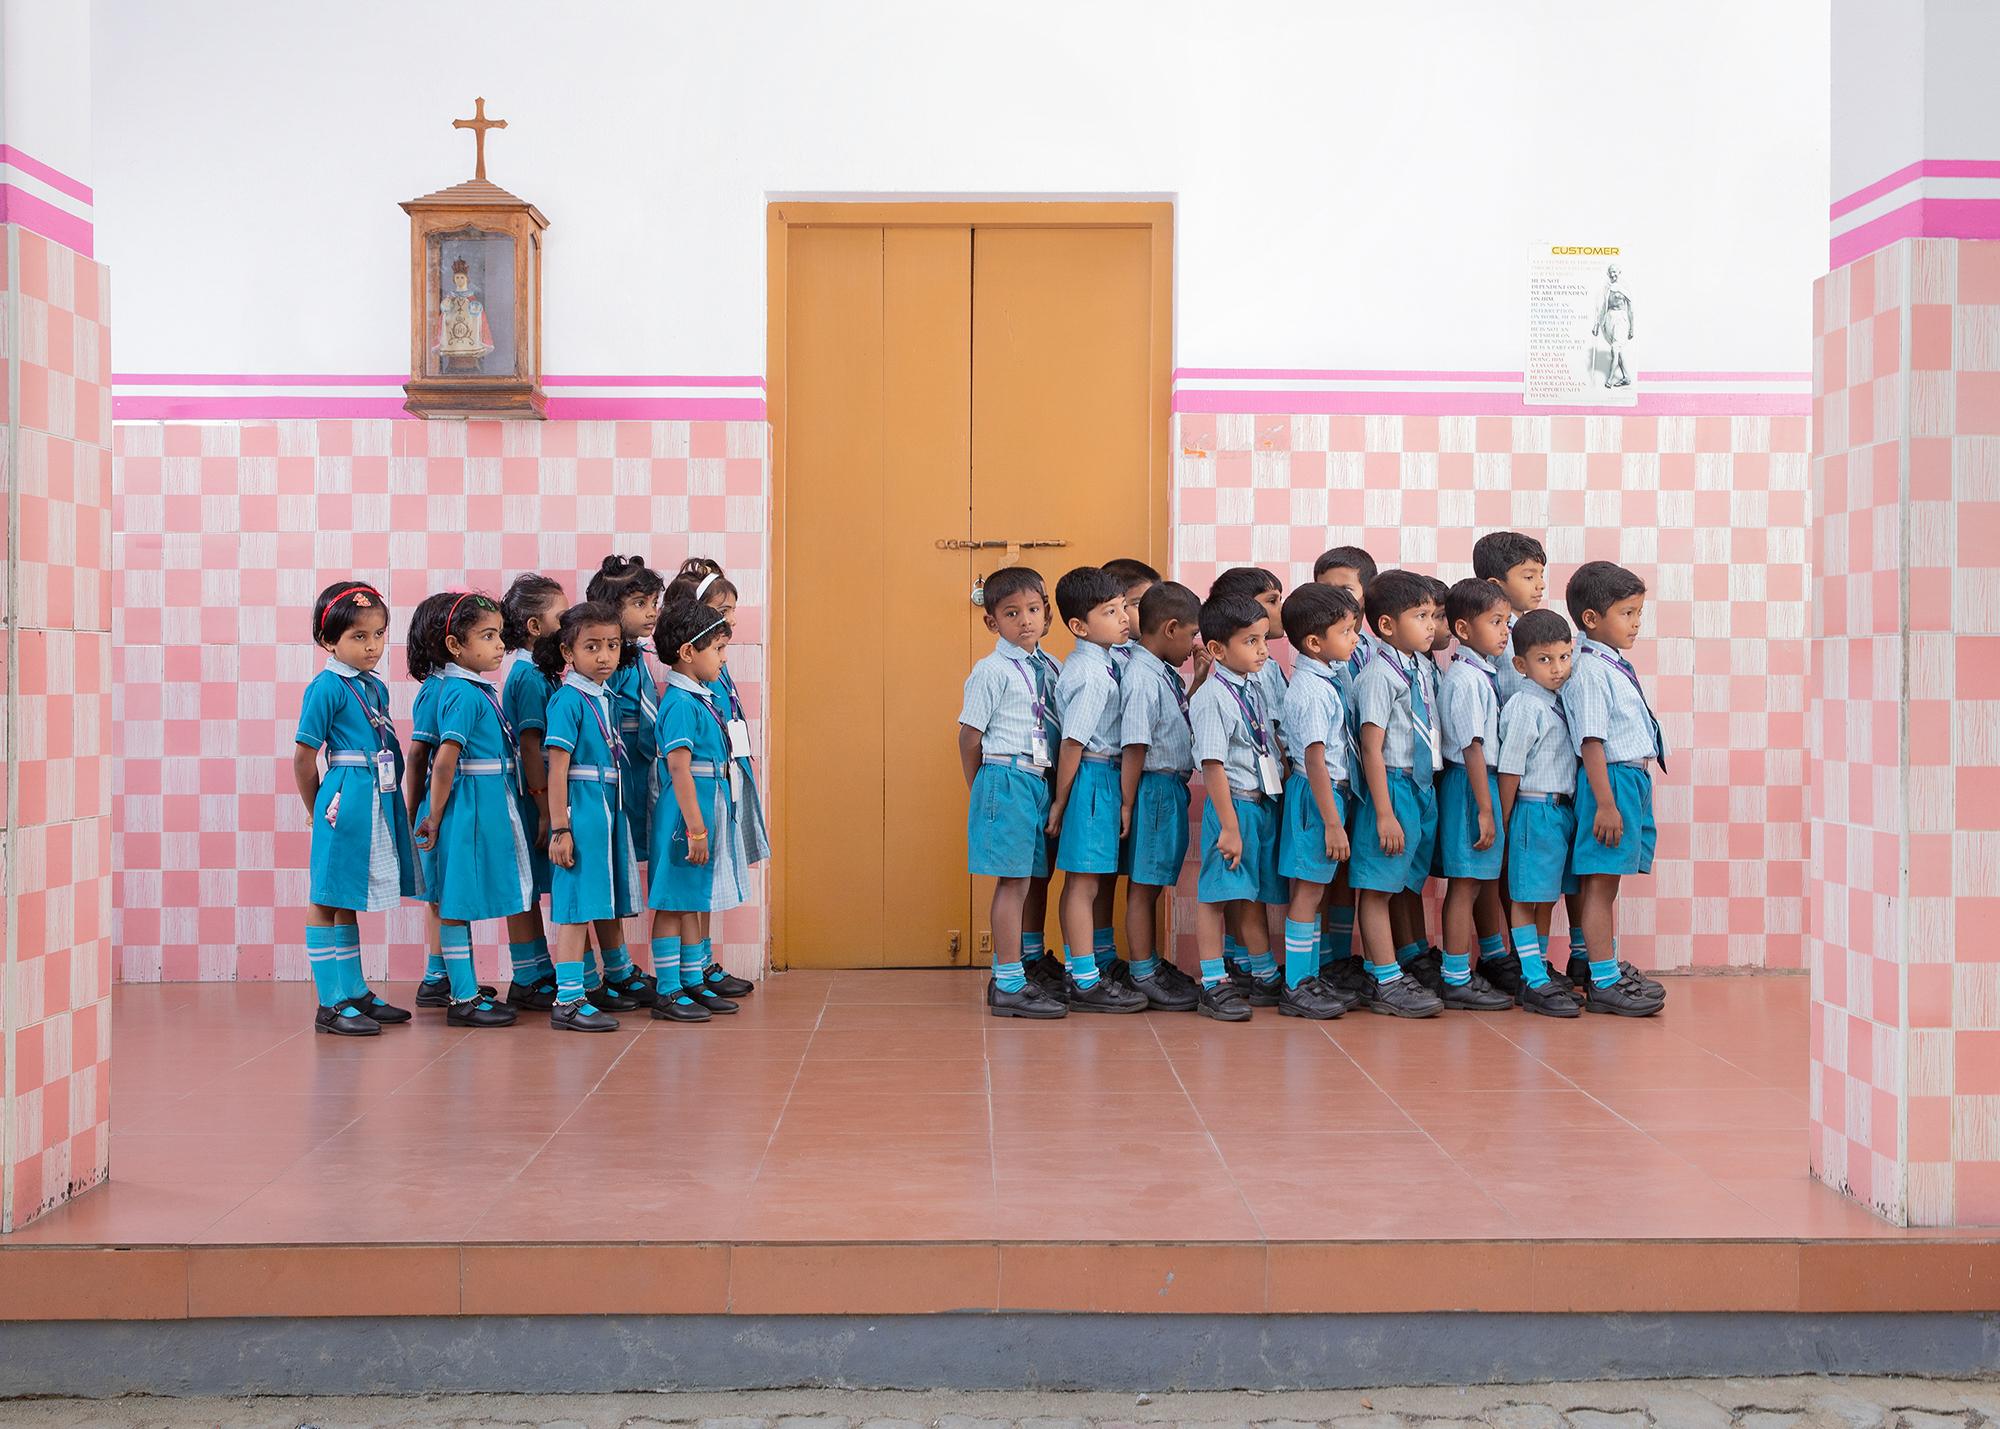 Renaud-Eck_Anouchka_School Kids in raw- Boys and Girls